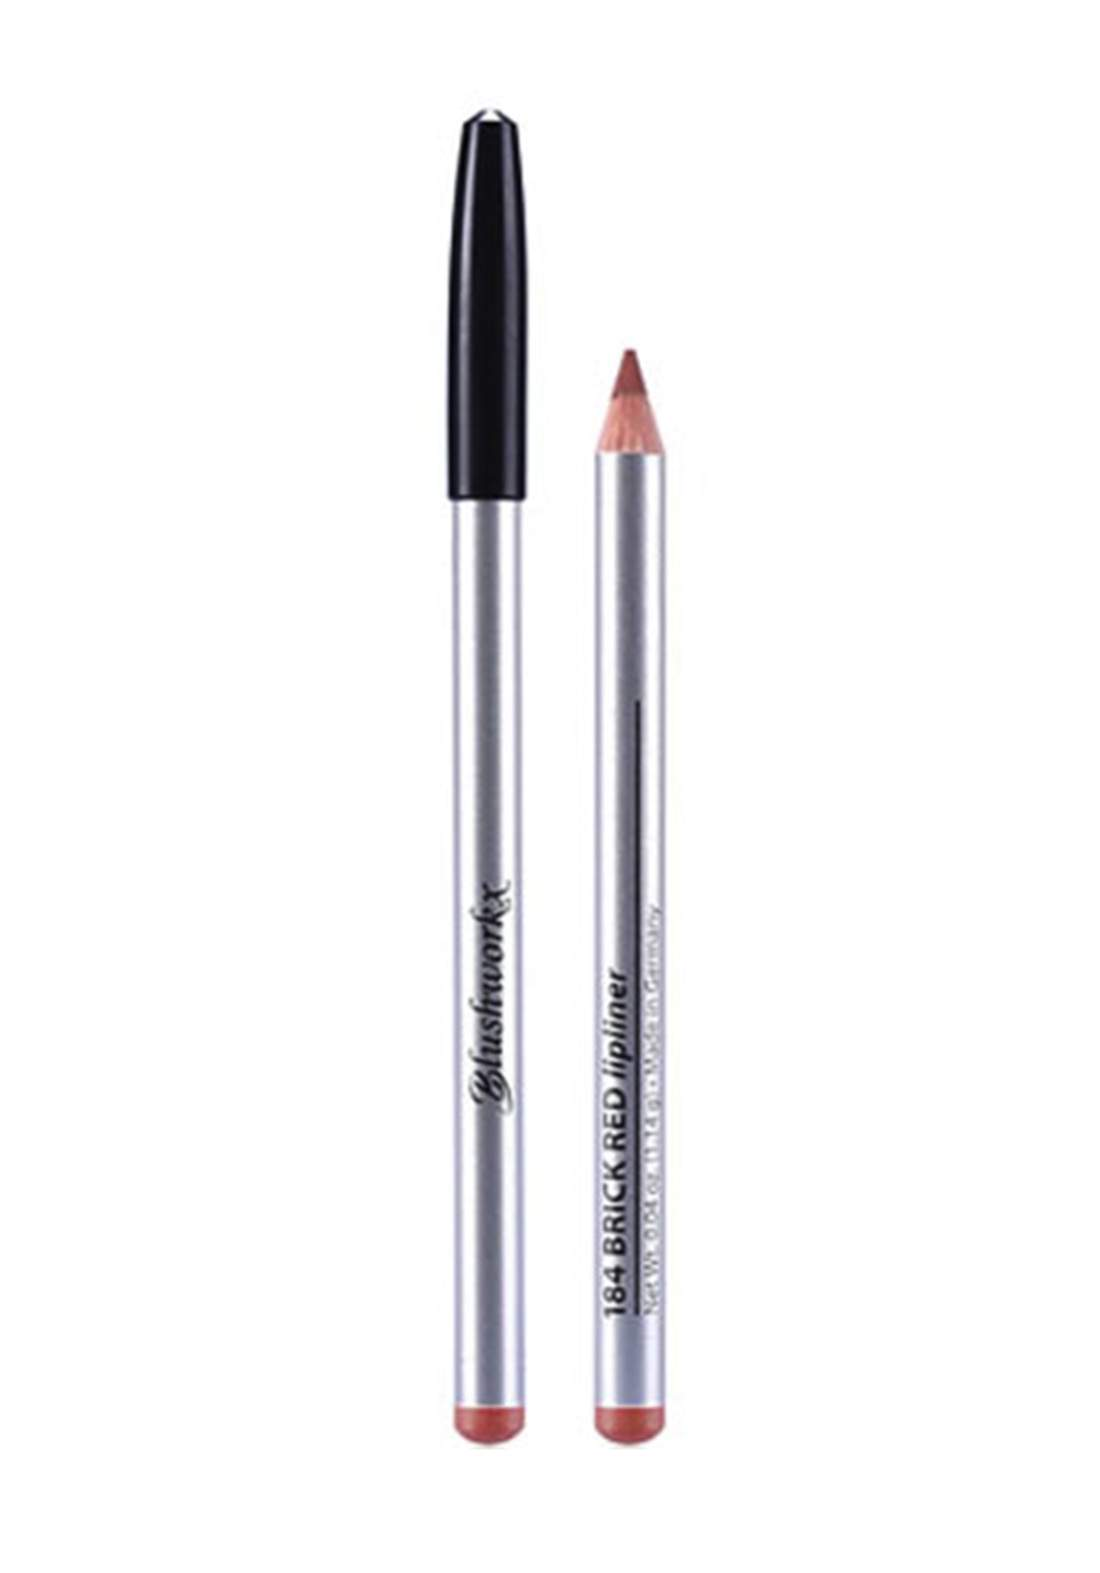 Blushworkx Hollywood Lip Liner Pencil No.193 Warm Nude 1.14g محدد الشفاه